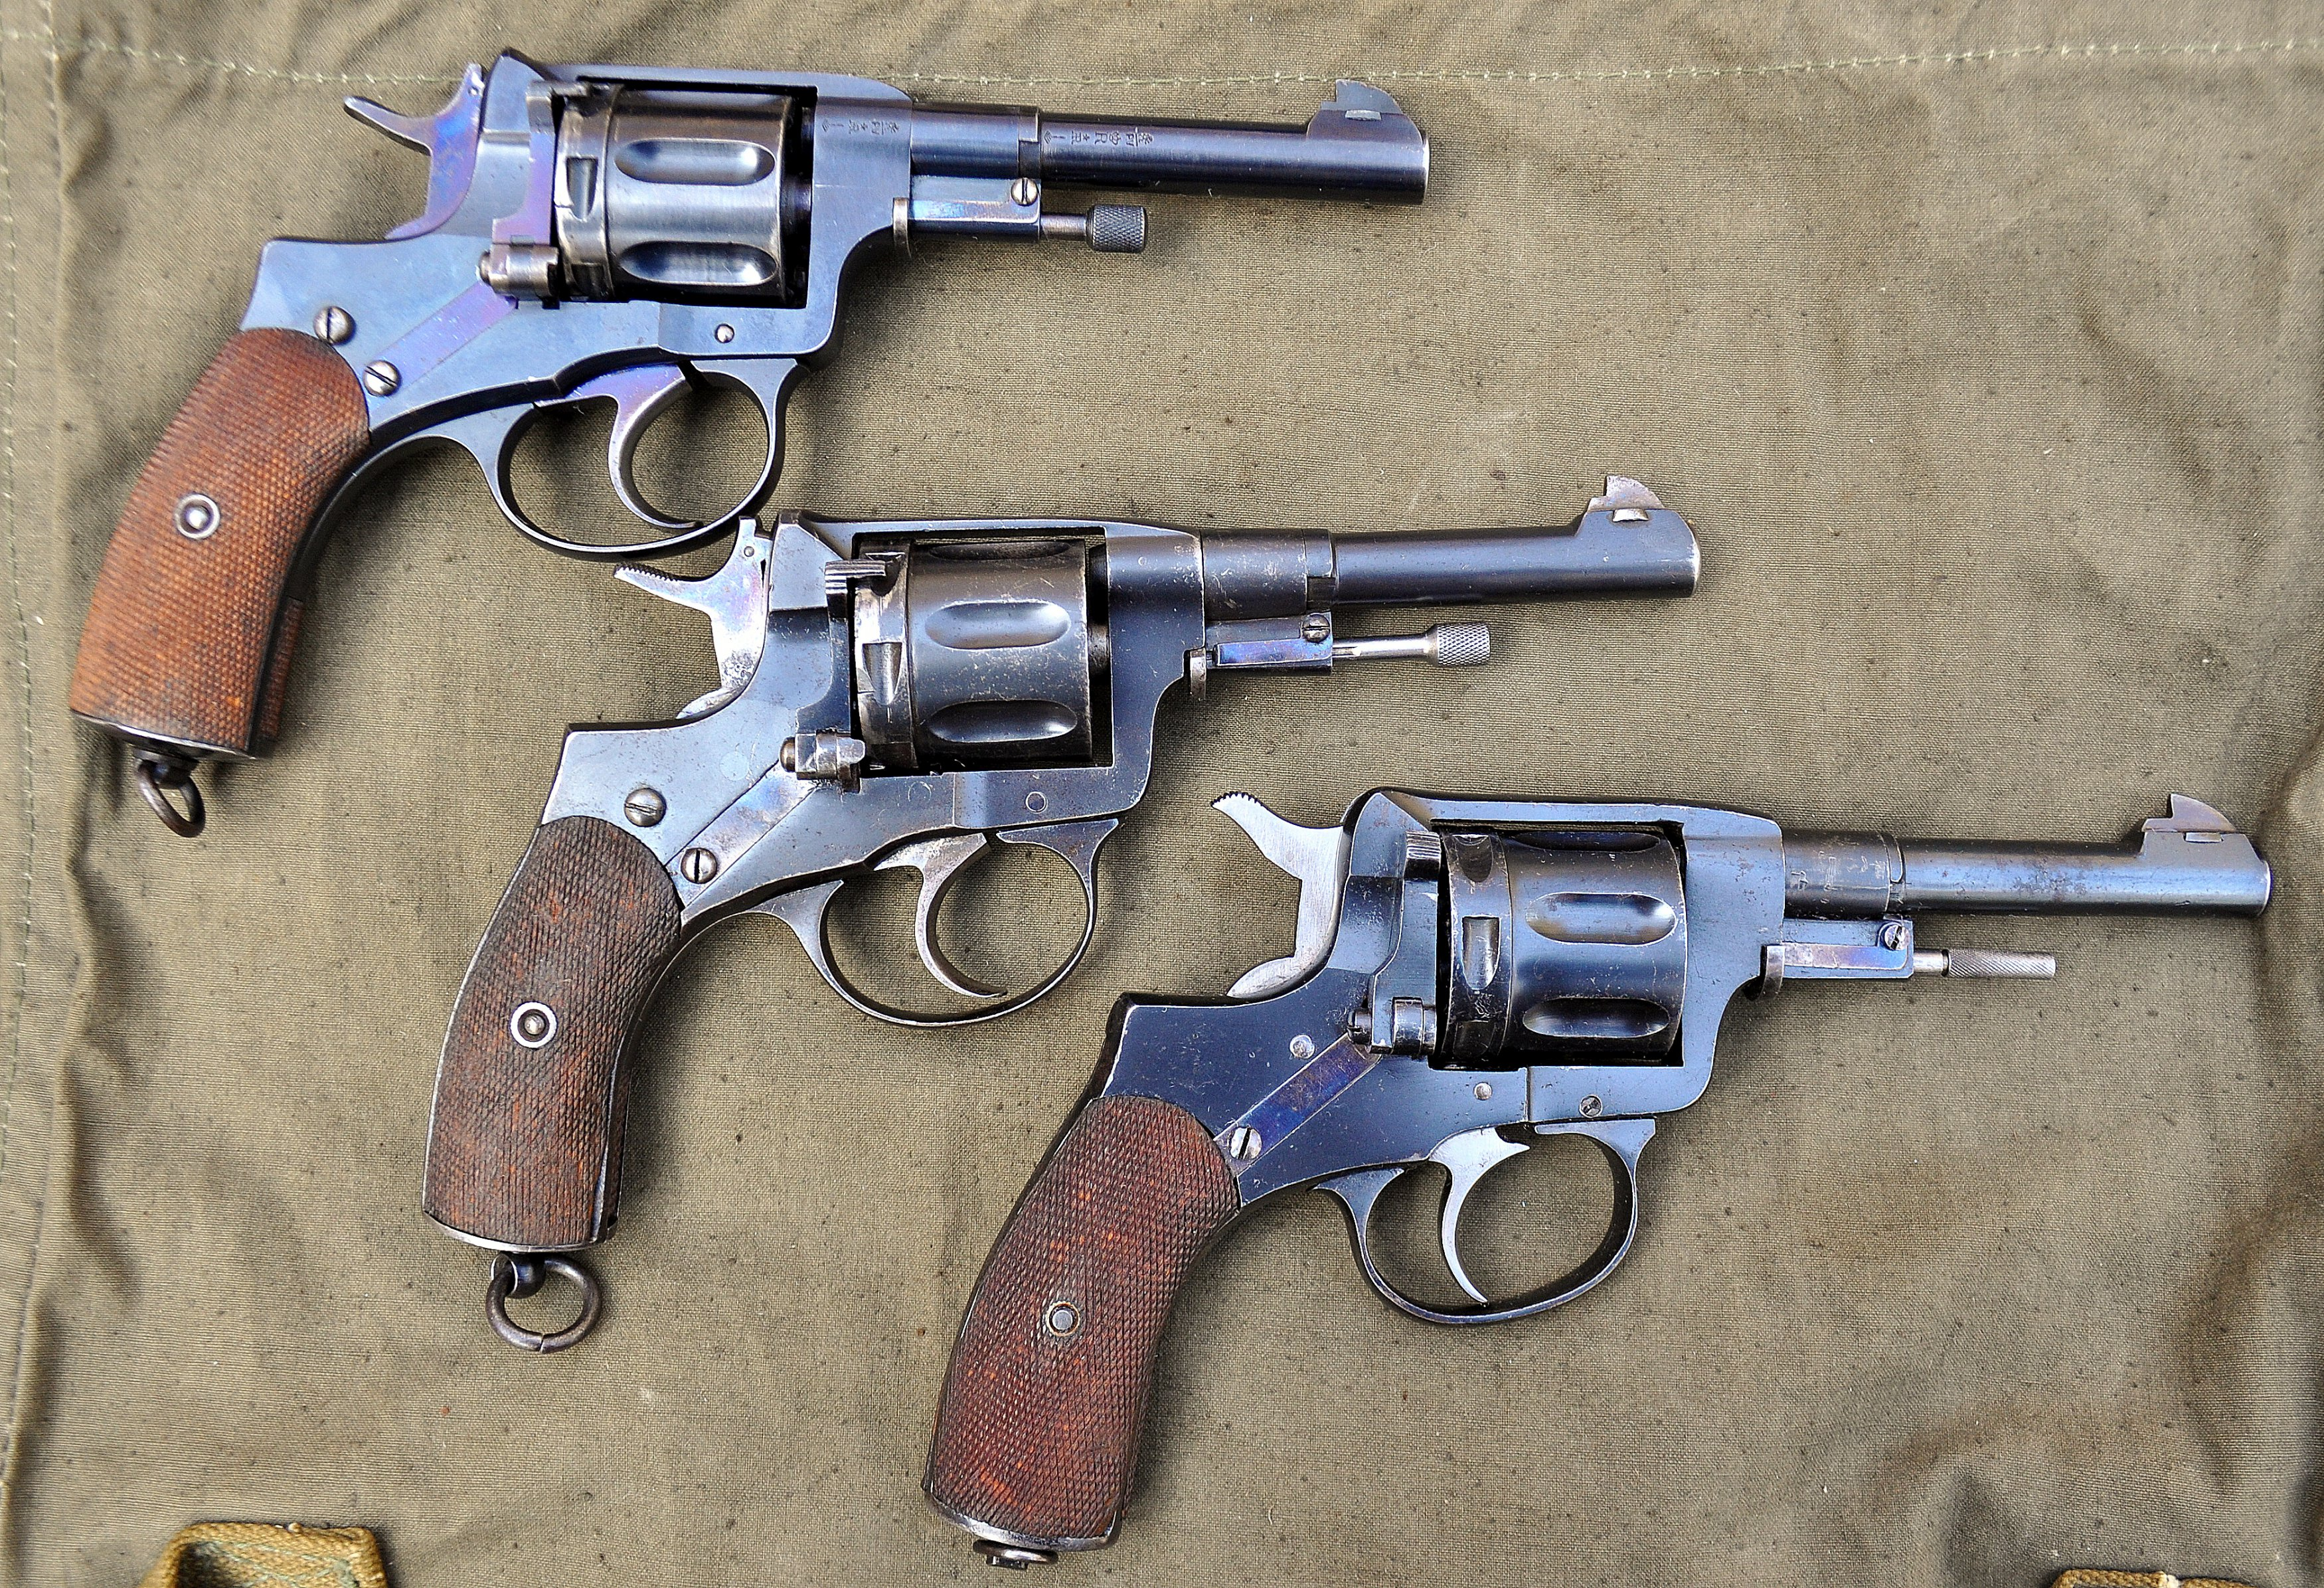 Spanish copies M1895 Nagant - need help to ID markings